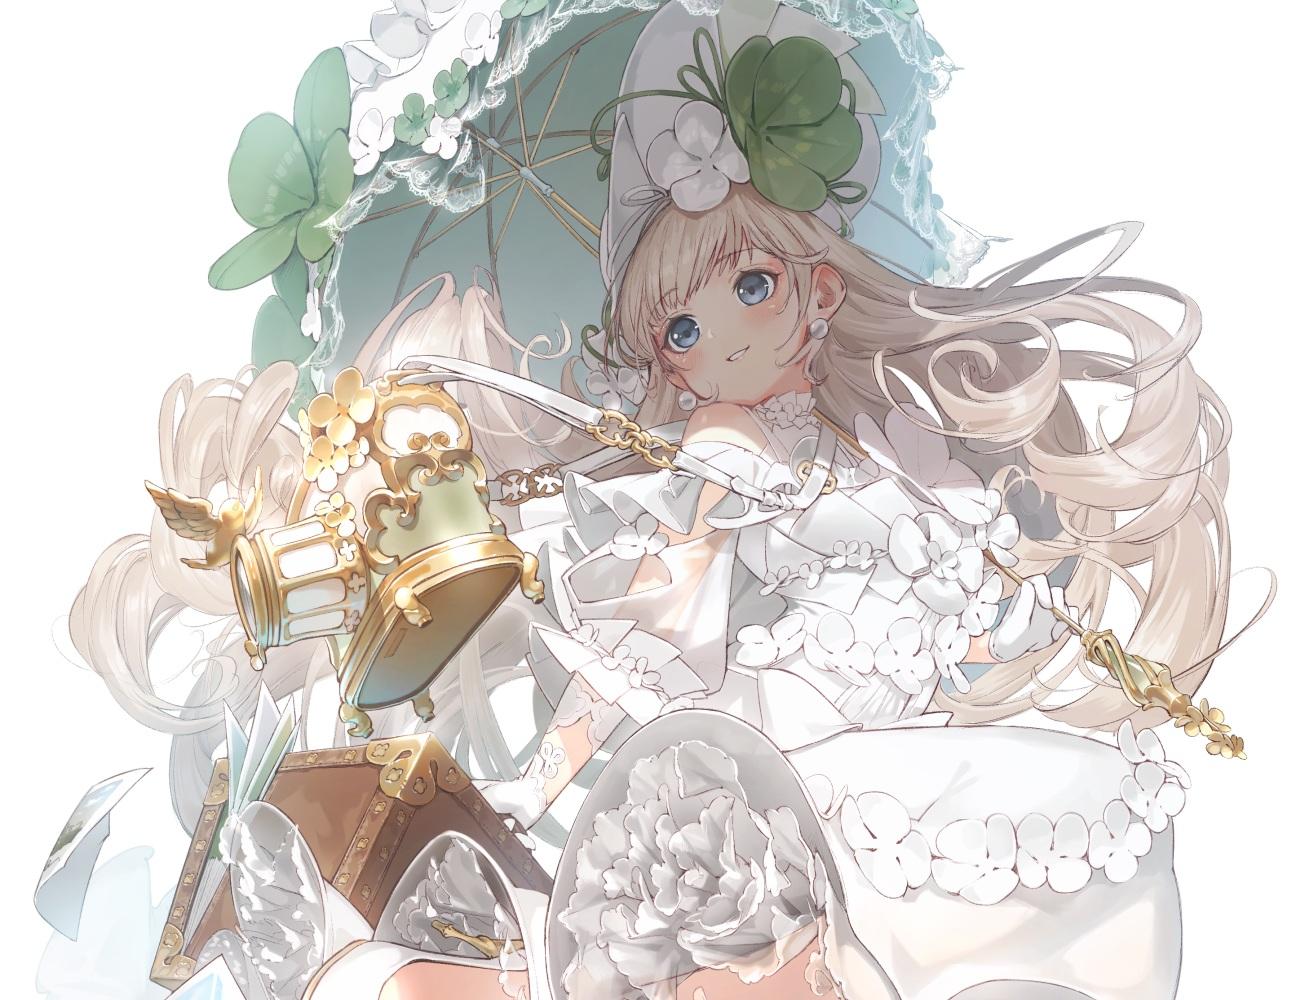 blonde_hair blue_eyes camera cropped dress gloves headdress lolita_fashion long_hair original paper ryota_(ry_o_ta) umbrella white